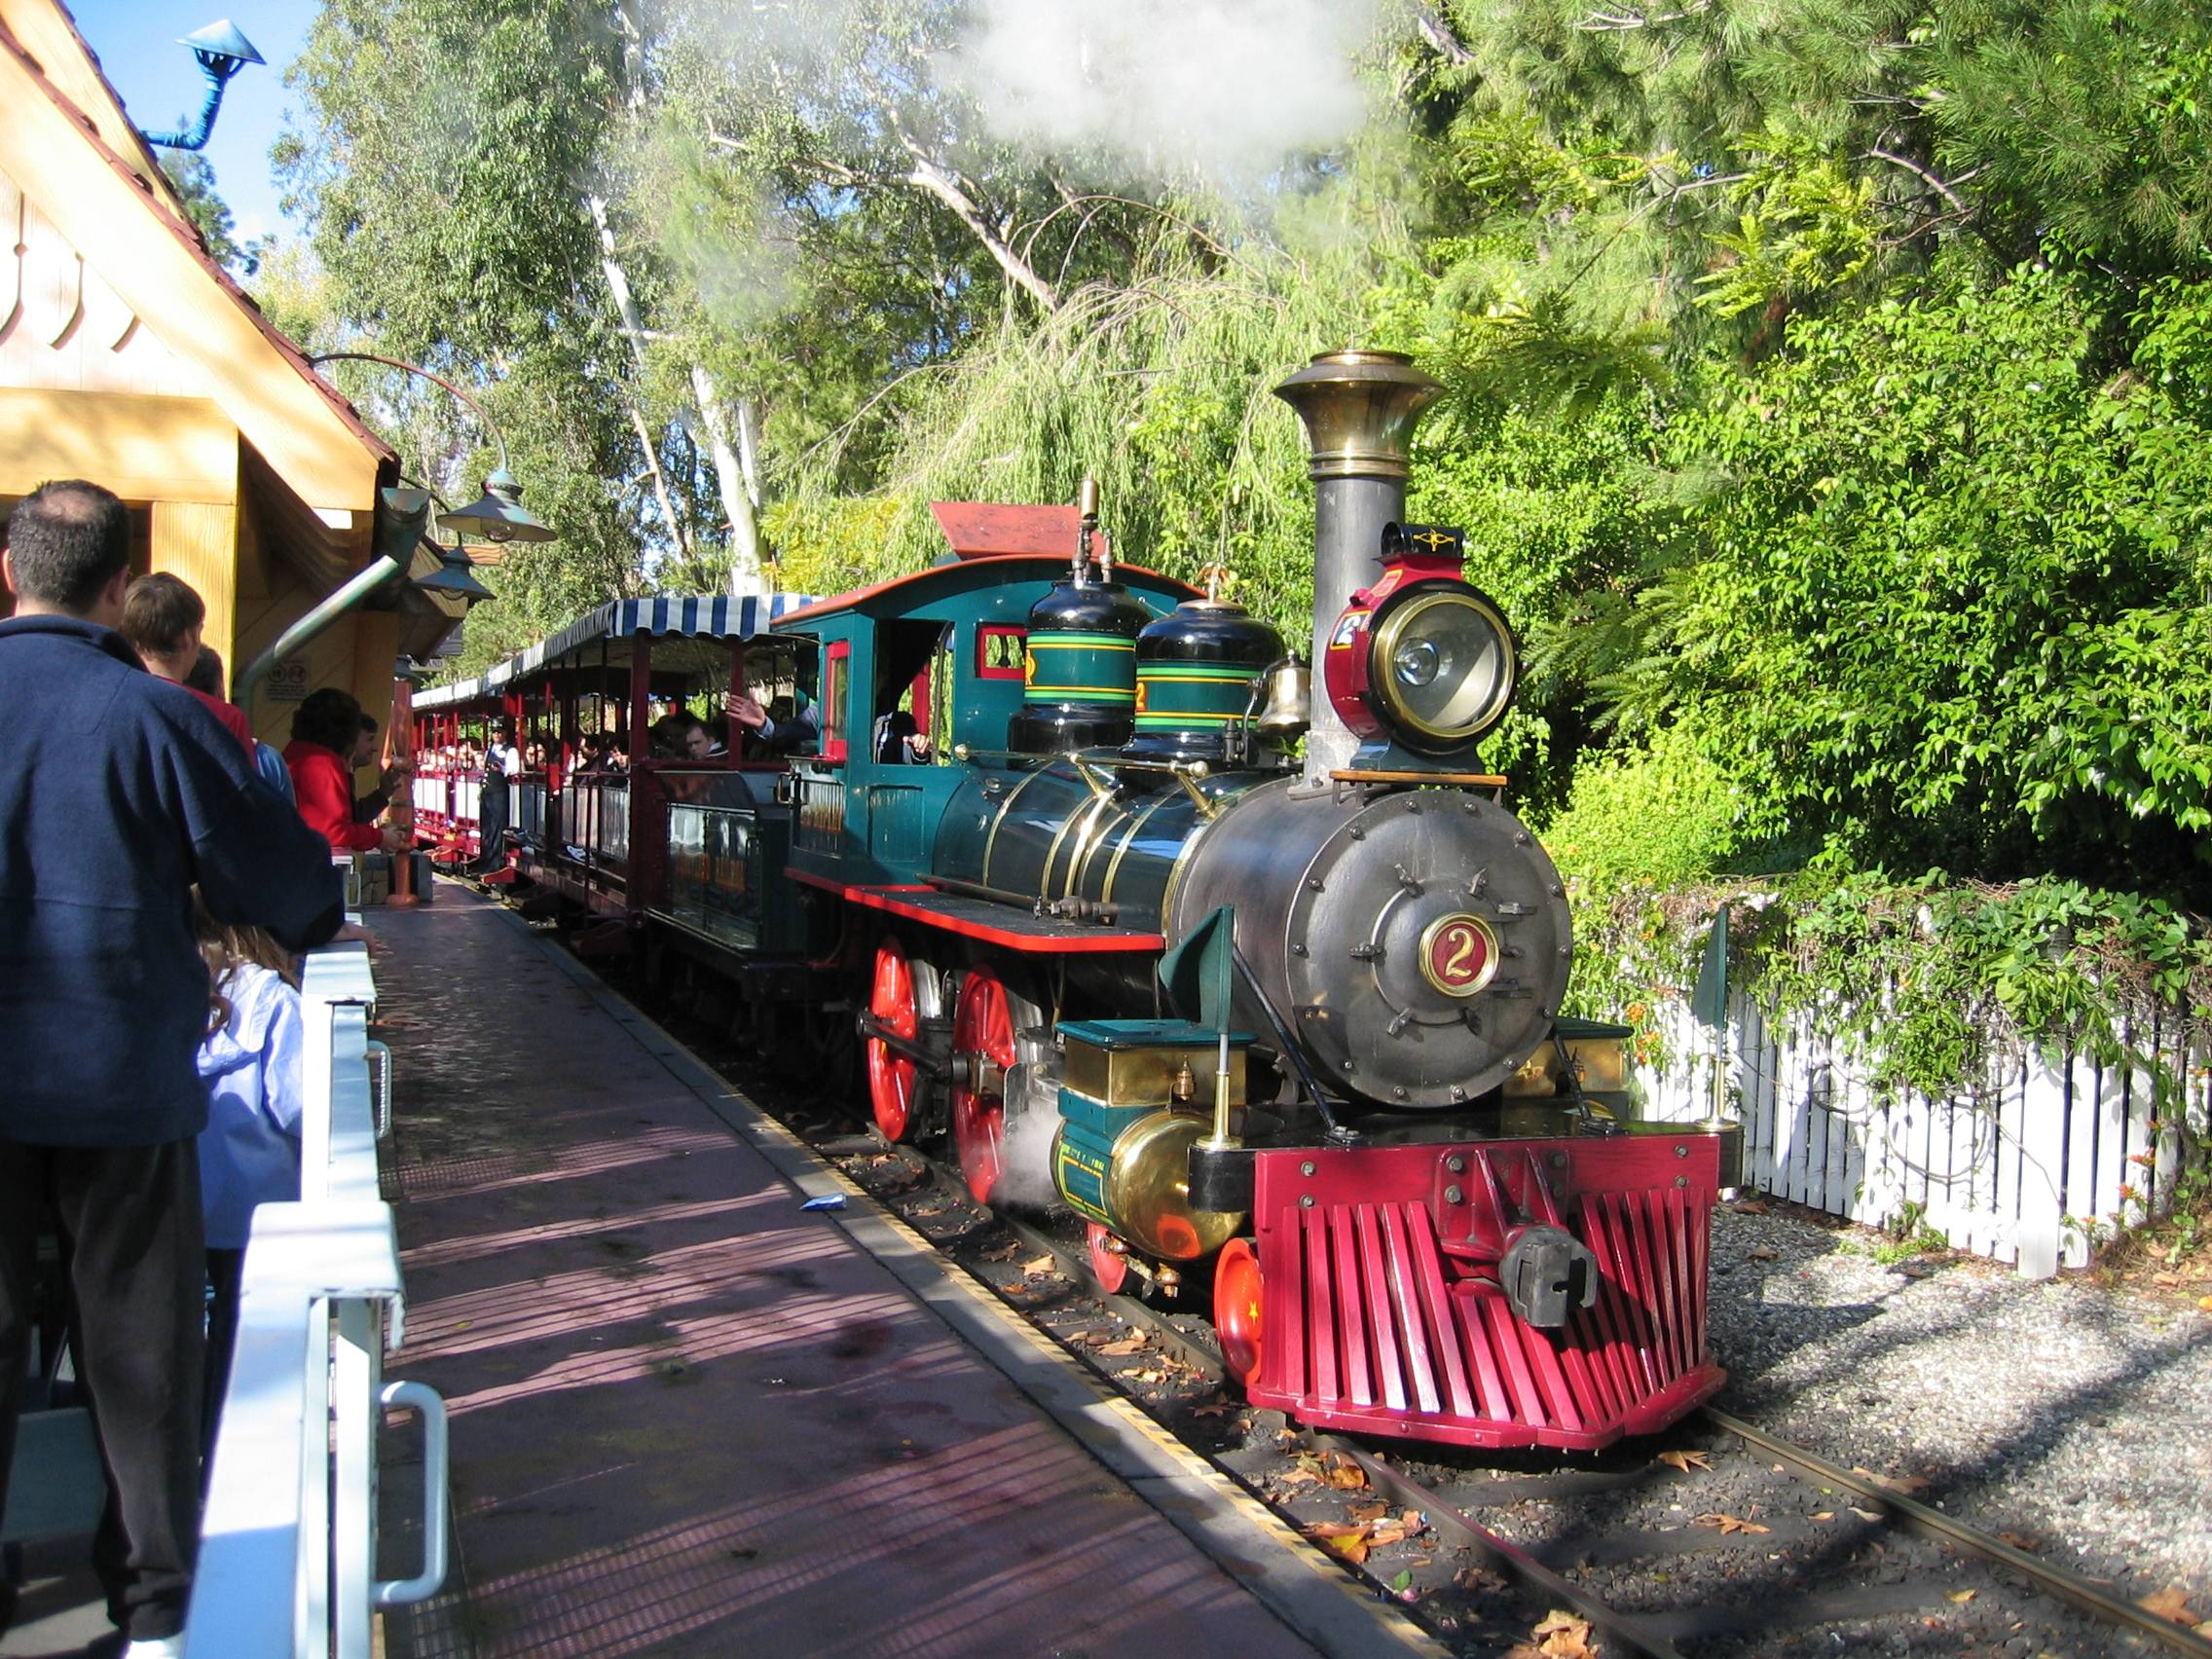 Disneyland Railroad Engine 2